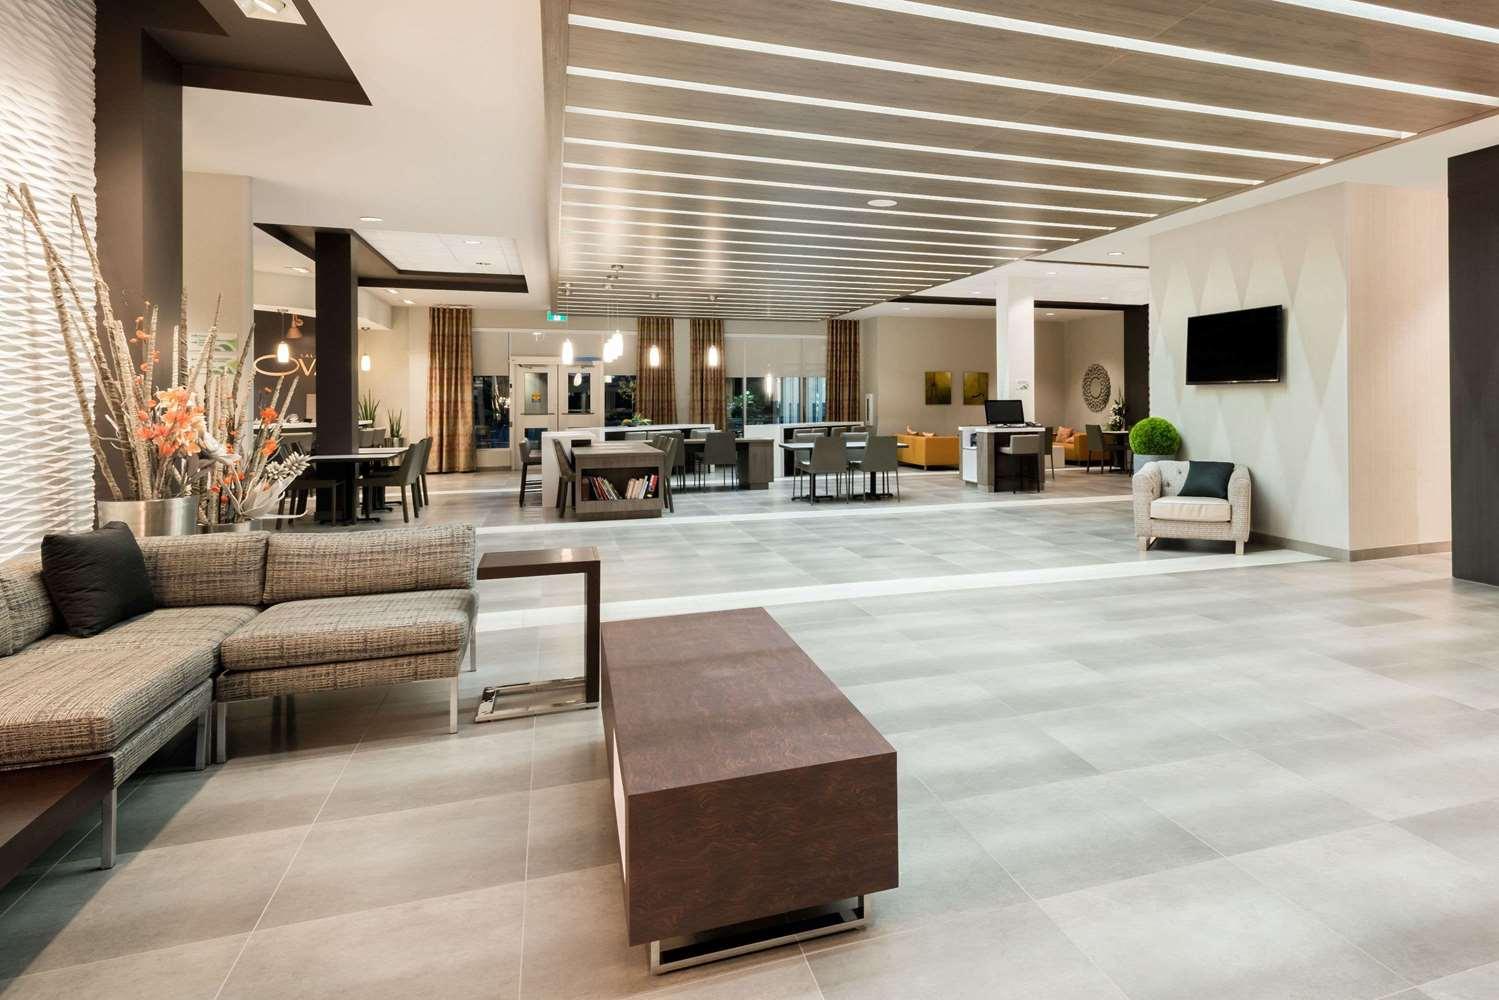 Lobby - Wingate by Wyndham Hotel Dieppe